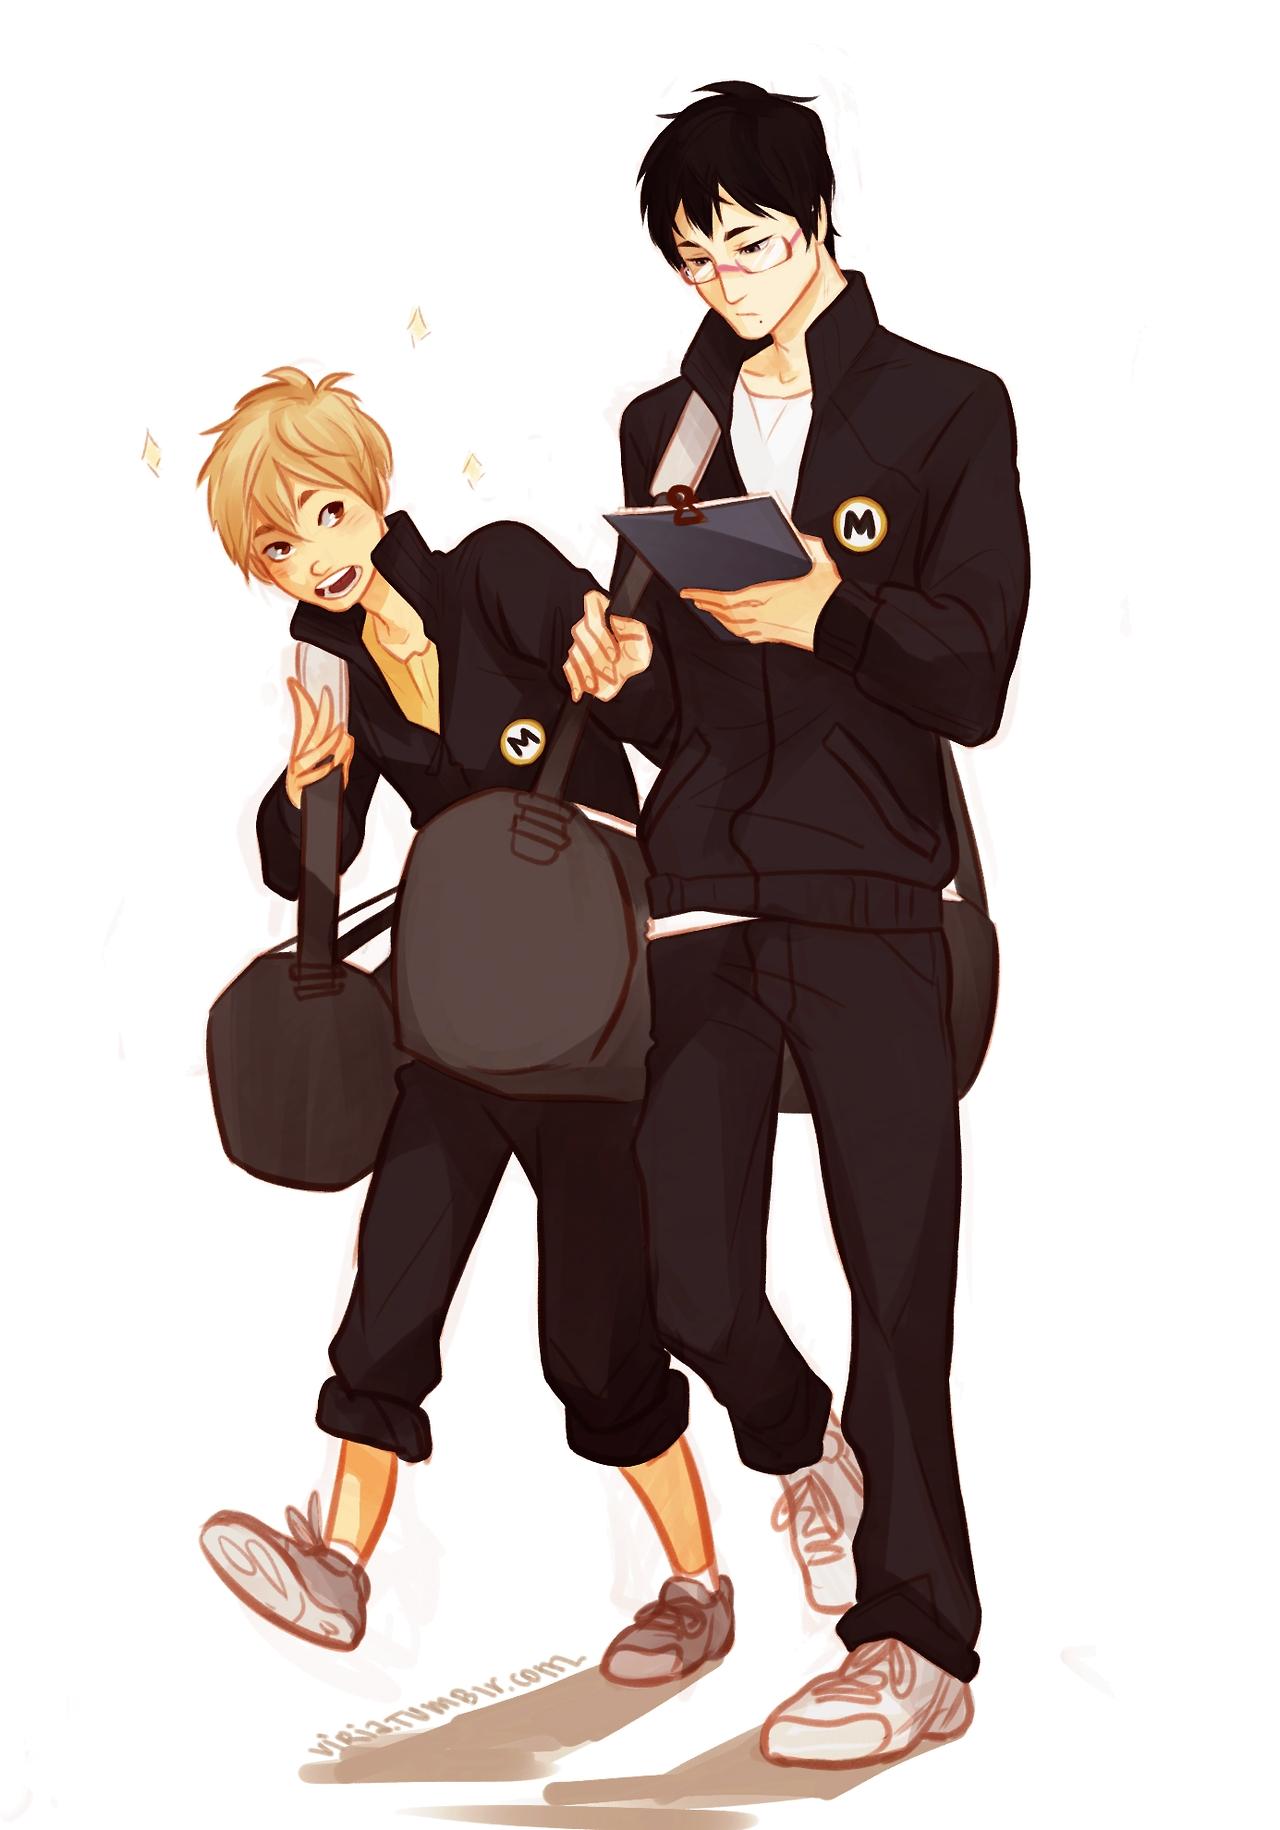 Haikyuu!! Mobile Wallpaper #1748261 - Zerochan Anime Image Board